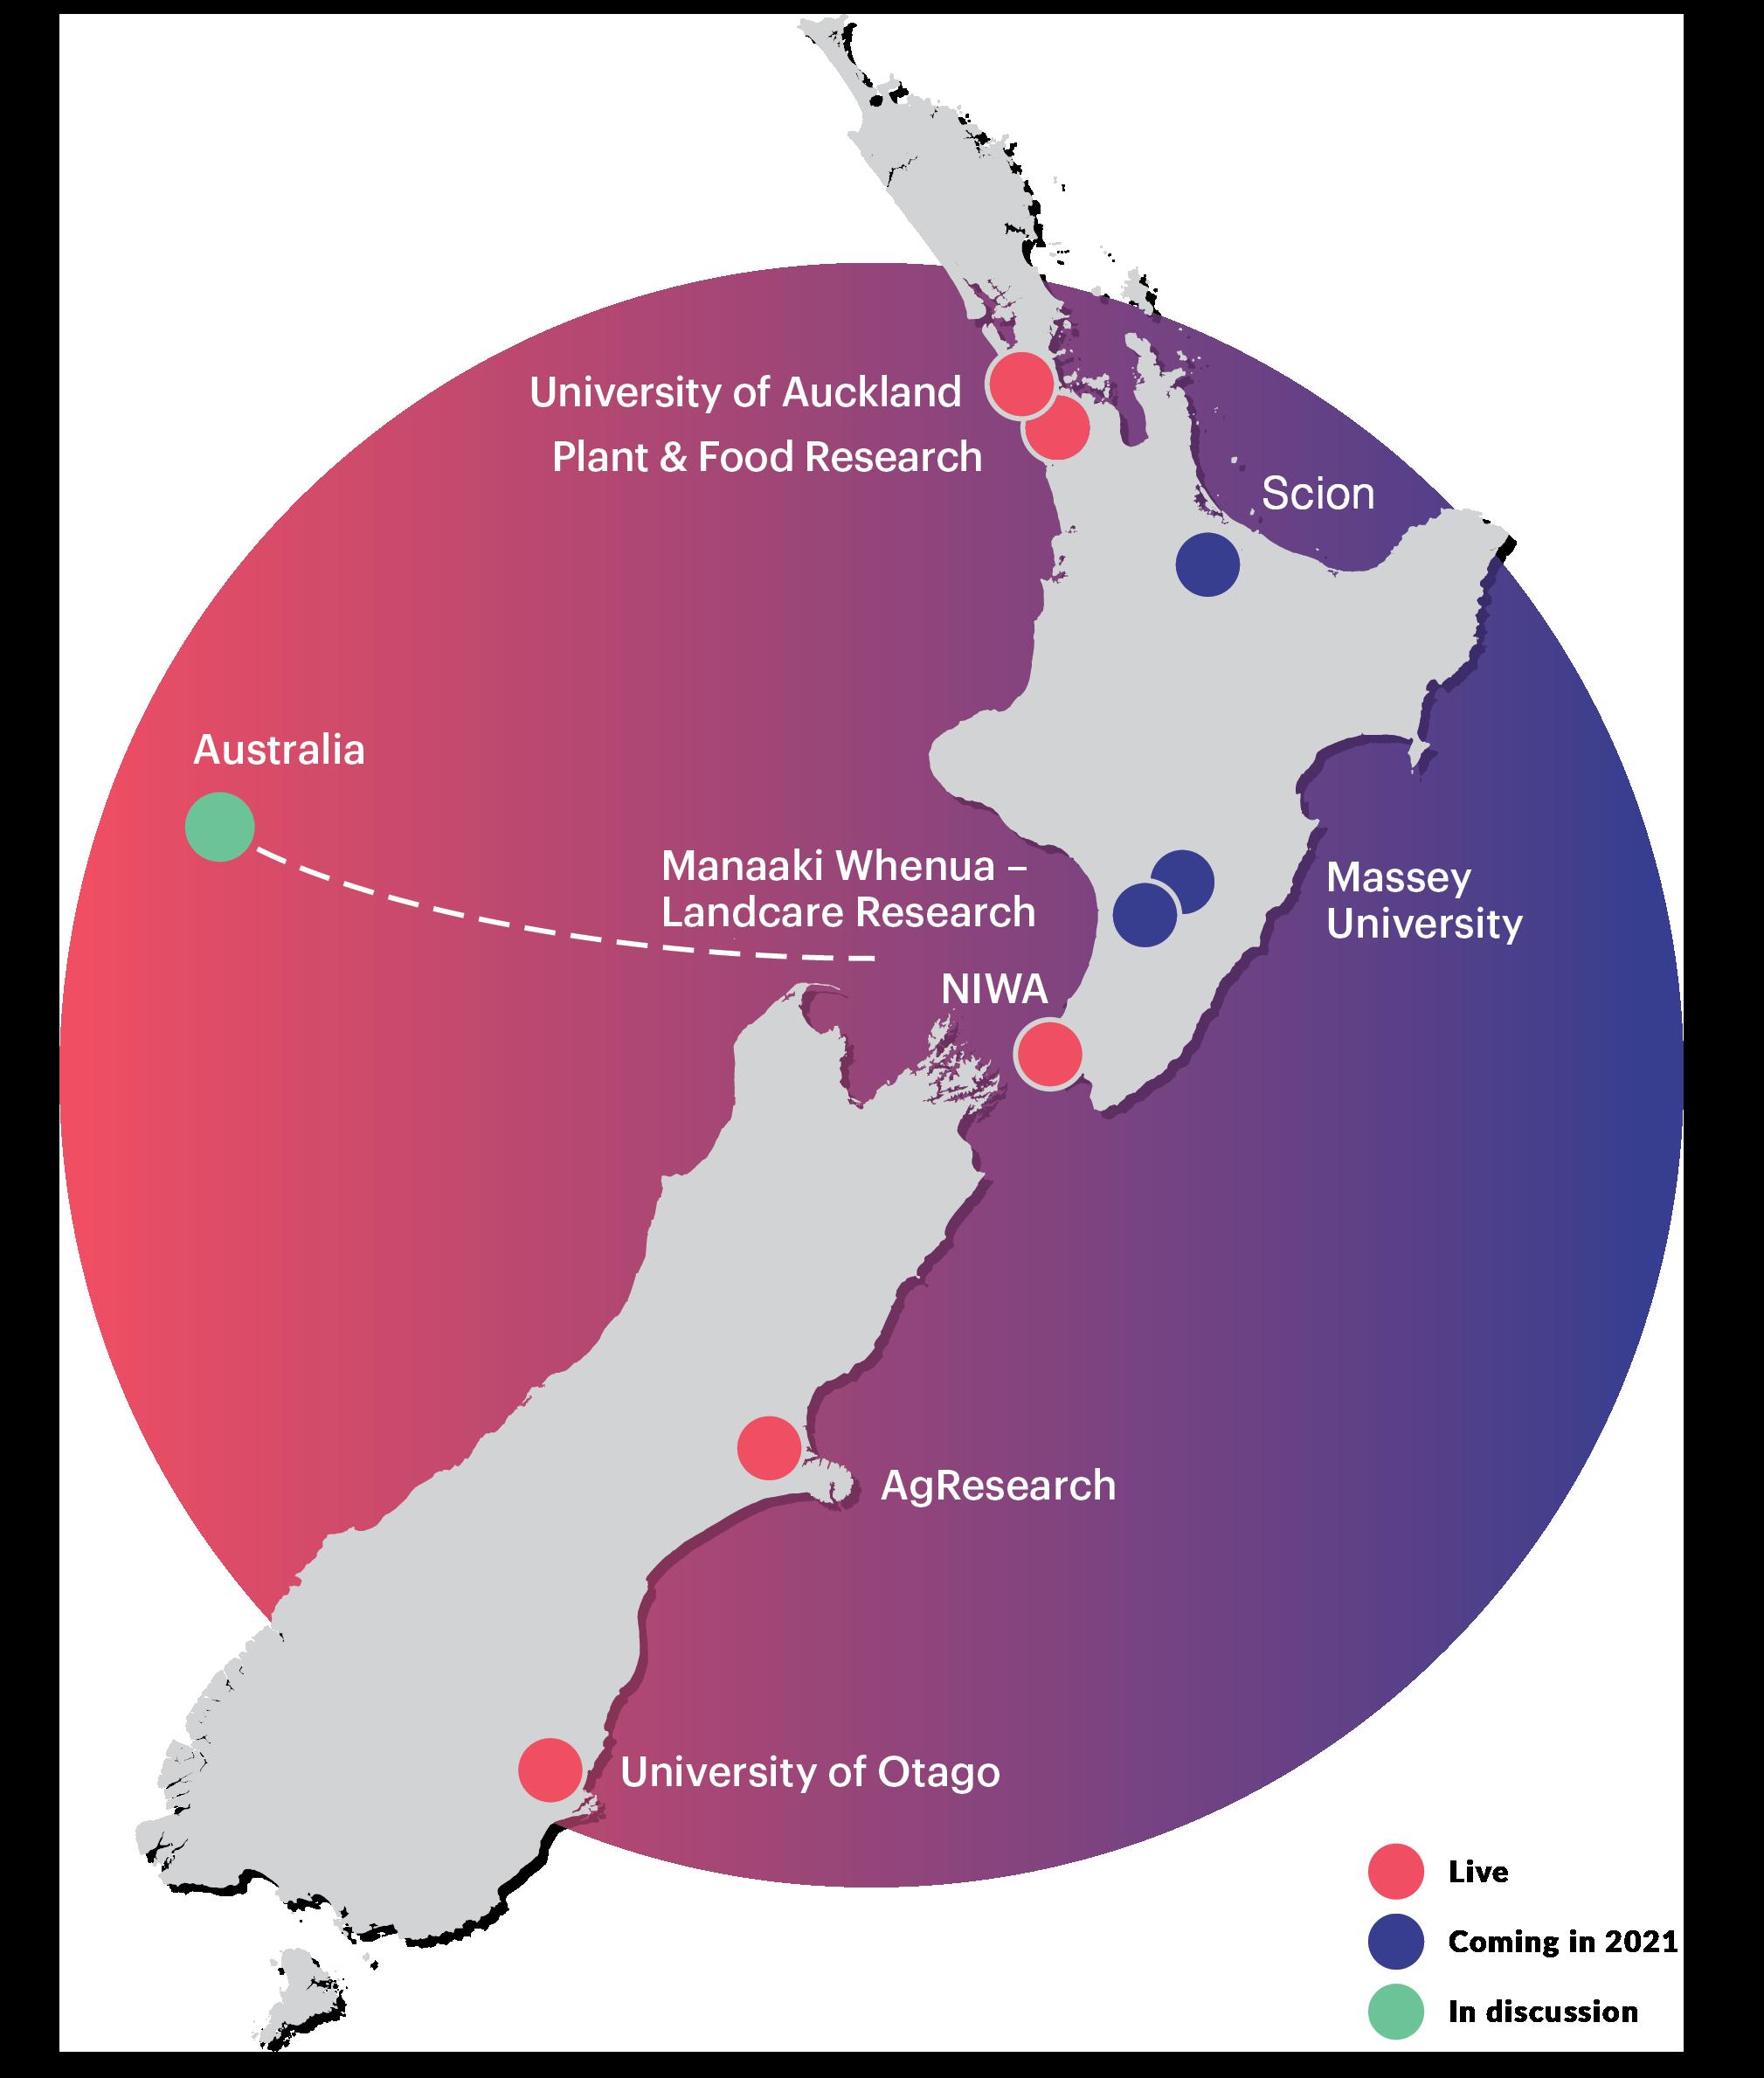 Map showing locations of NeSI's five live endpoints: Auckland, Hamilton, Rotorua, Wellington and Dunedin.